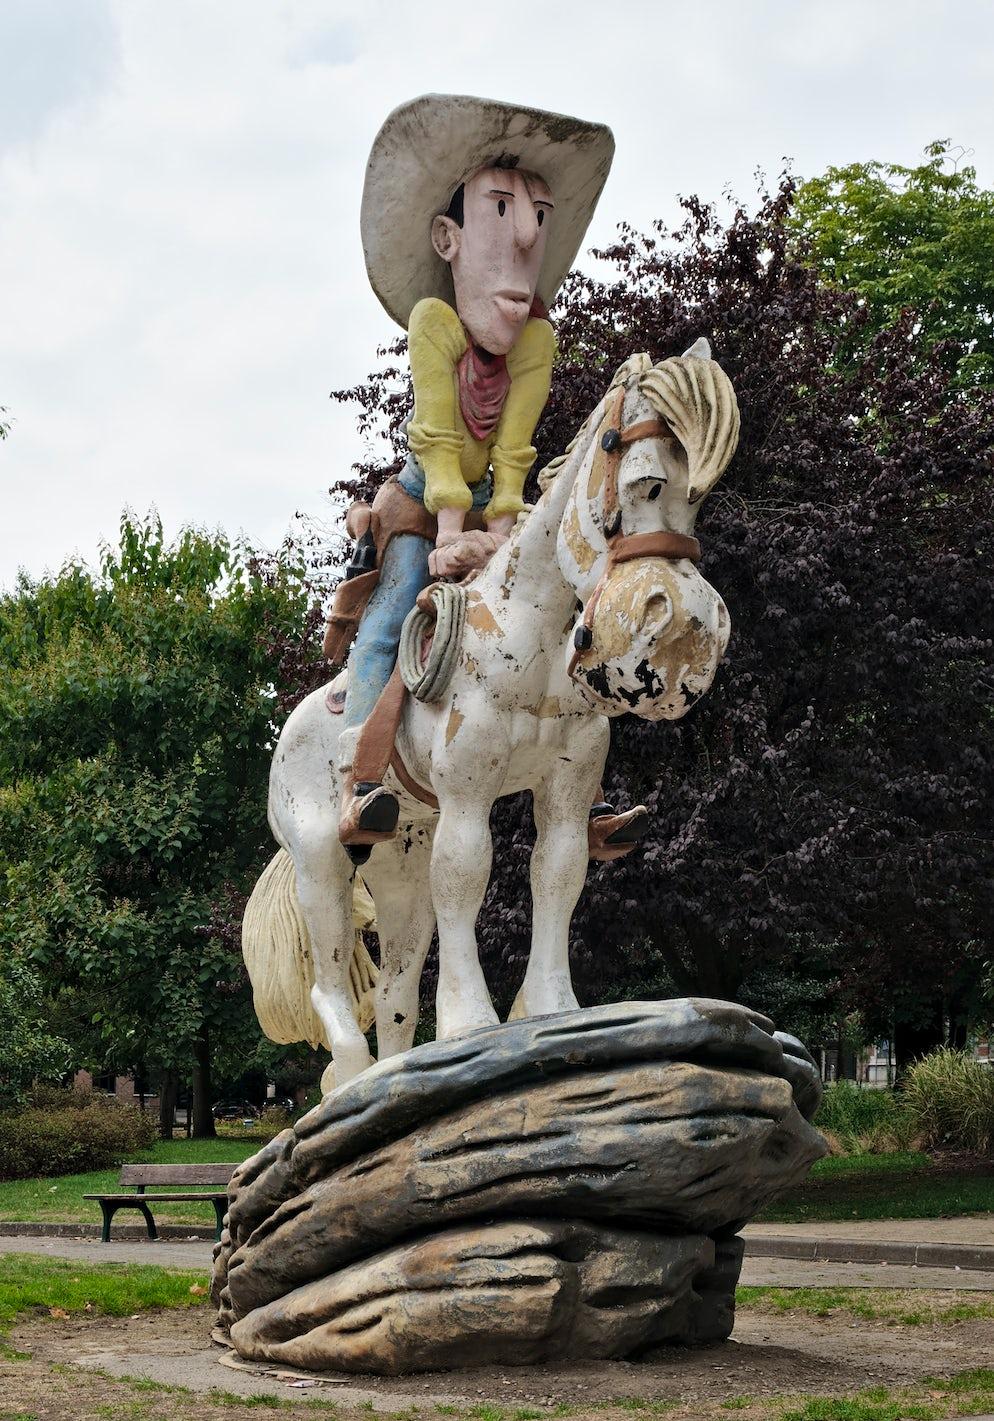 Statue of Lucky Luke in Charleroi © To Wikipédia/Trougnouf (Benoit Brummer)